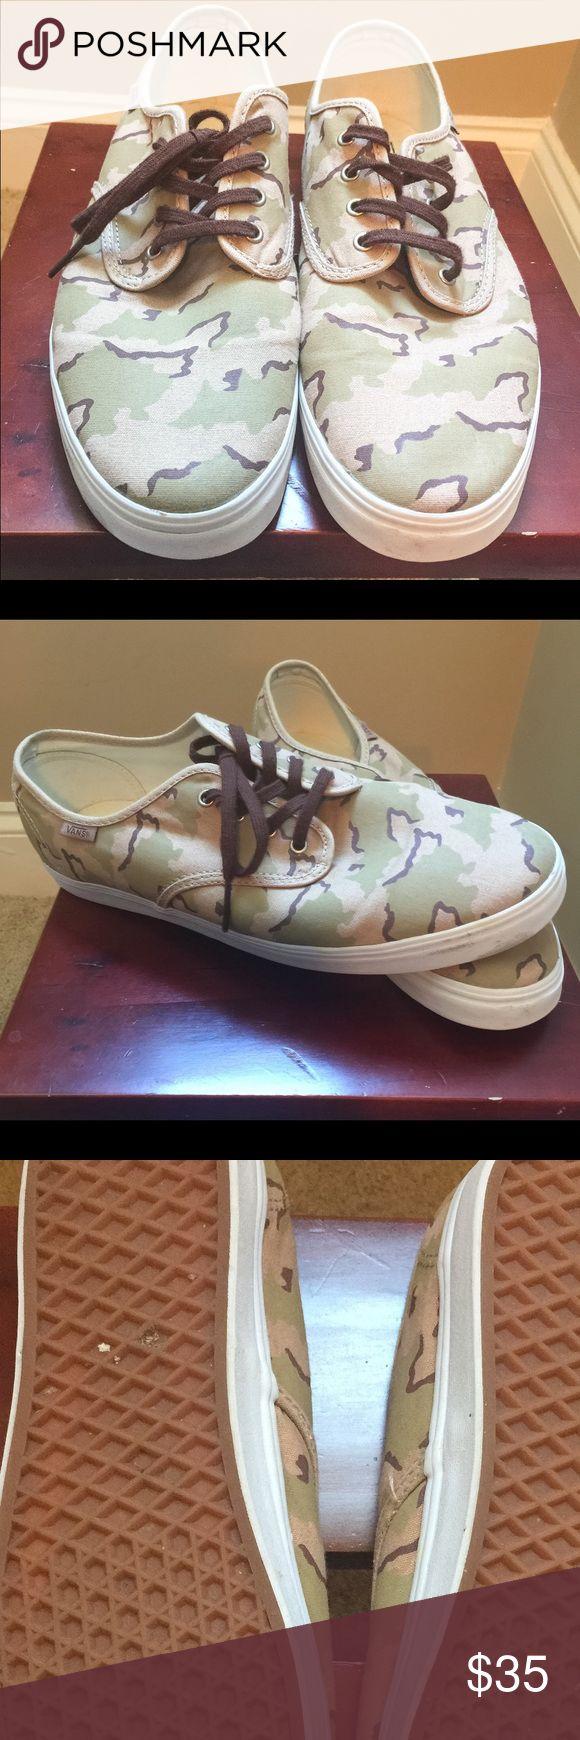 Vans in Camo Men's Size 11.5 Vans in camo print Men's size 11.5. Pre loved and still almost new❗️💥🙌🏻 Vans Shoes Sneakers